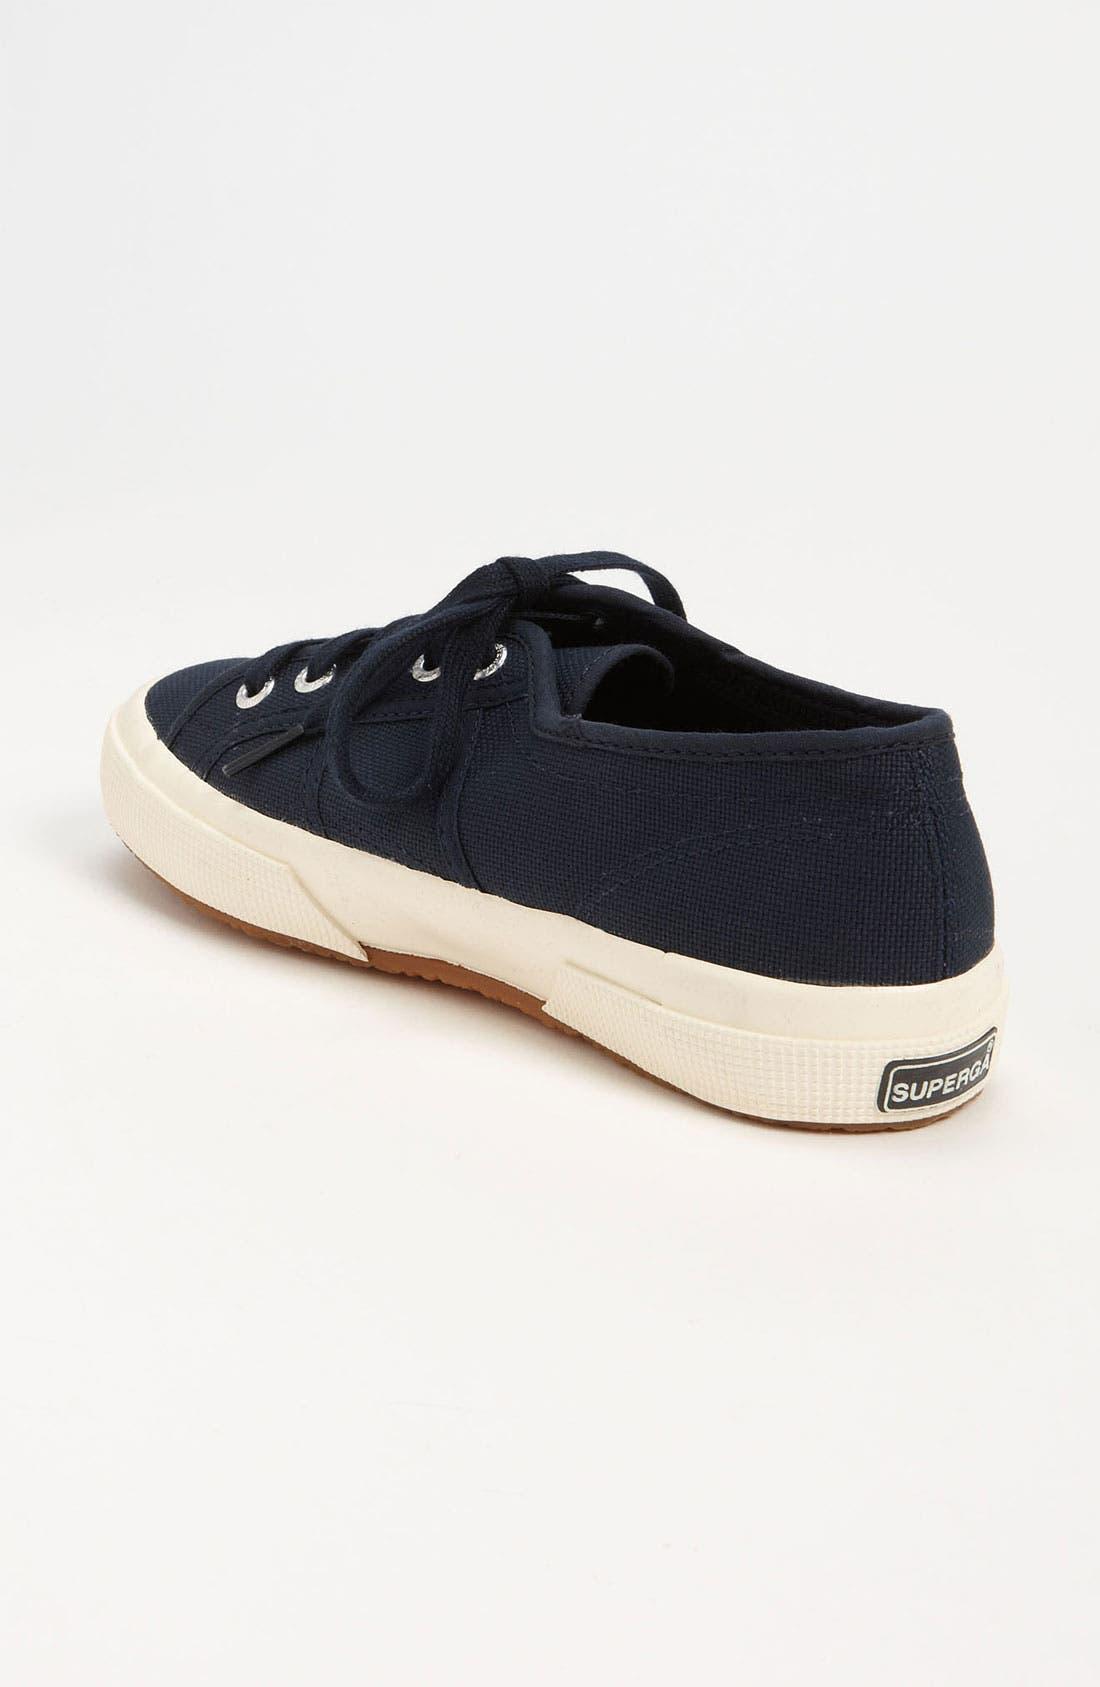 'Cotu' Sneaker,                             Alternate thumbnail 2, color,                             Navy Canvas